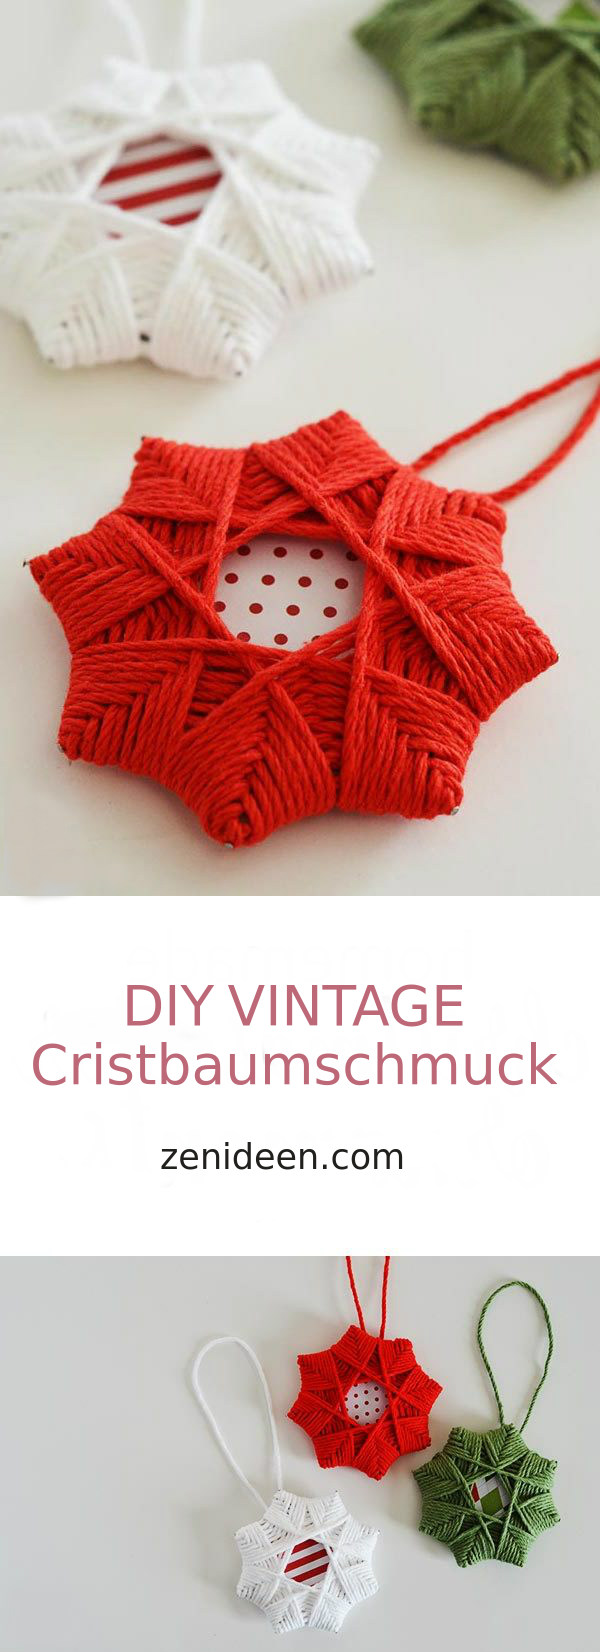 DIY Vintage Christbaumschmuck